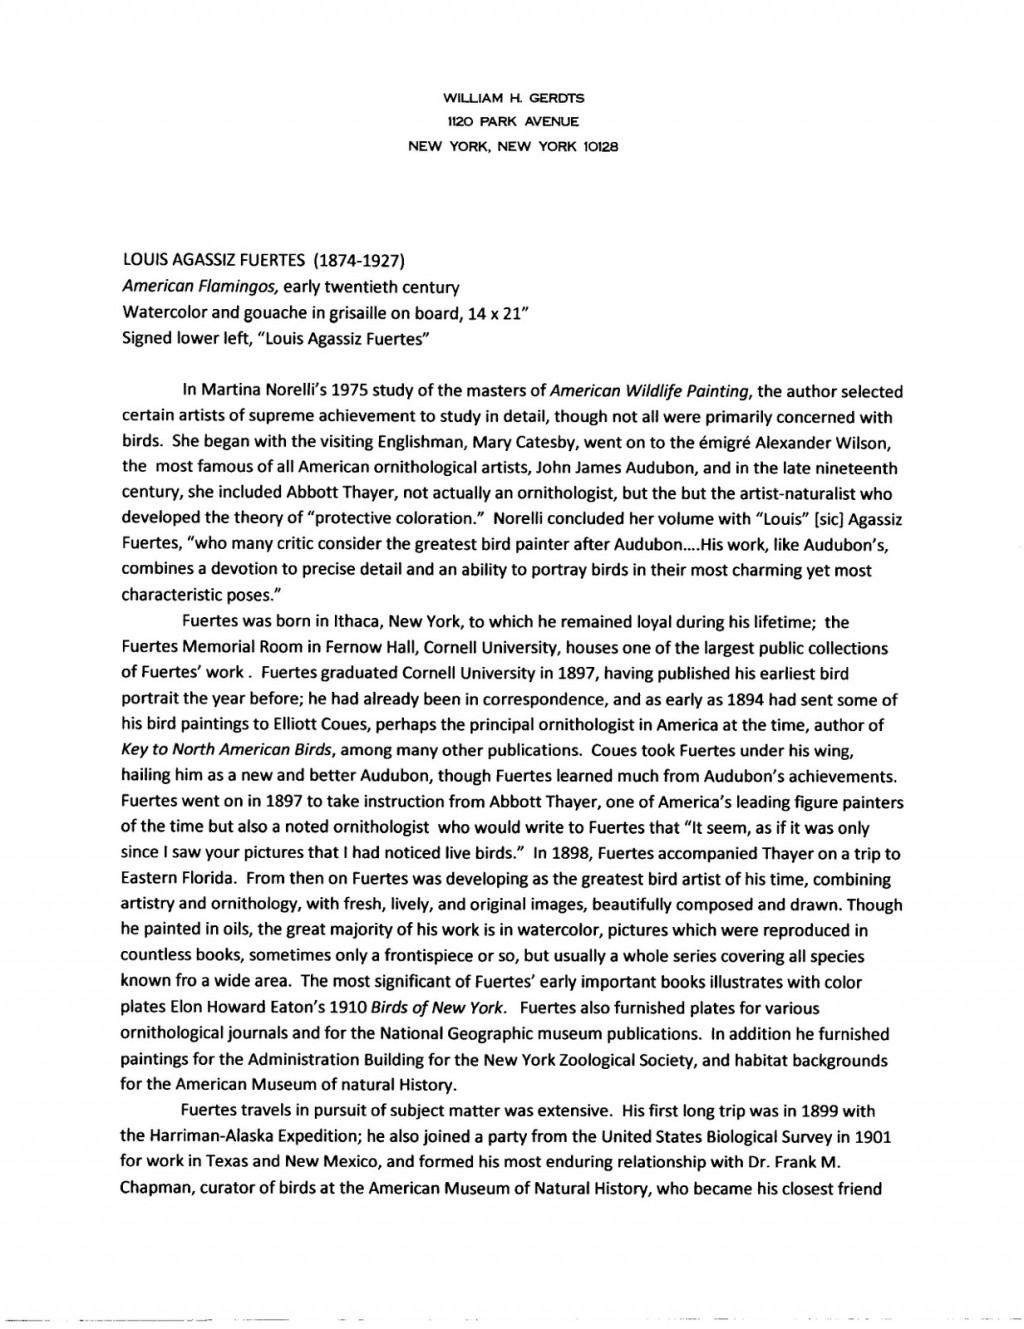 002 Graduate Admissions Essay Fuertes20american20flamingos20001 Wondrous Sample Education Examples Nursing Admission Samples Large